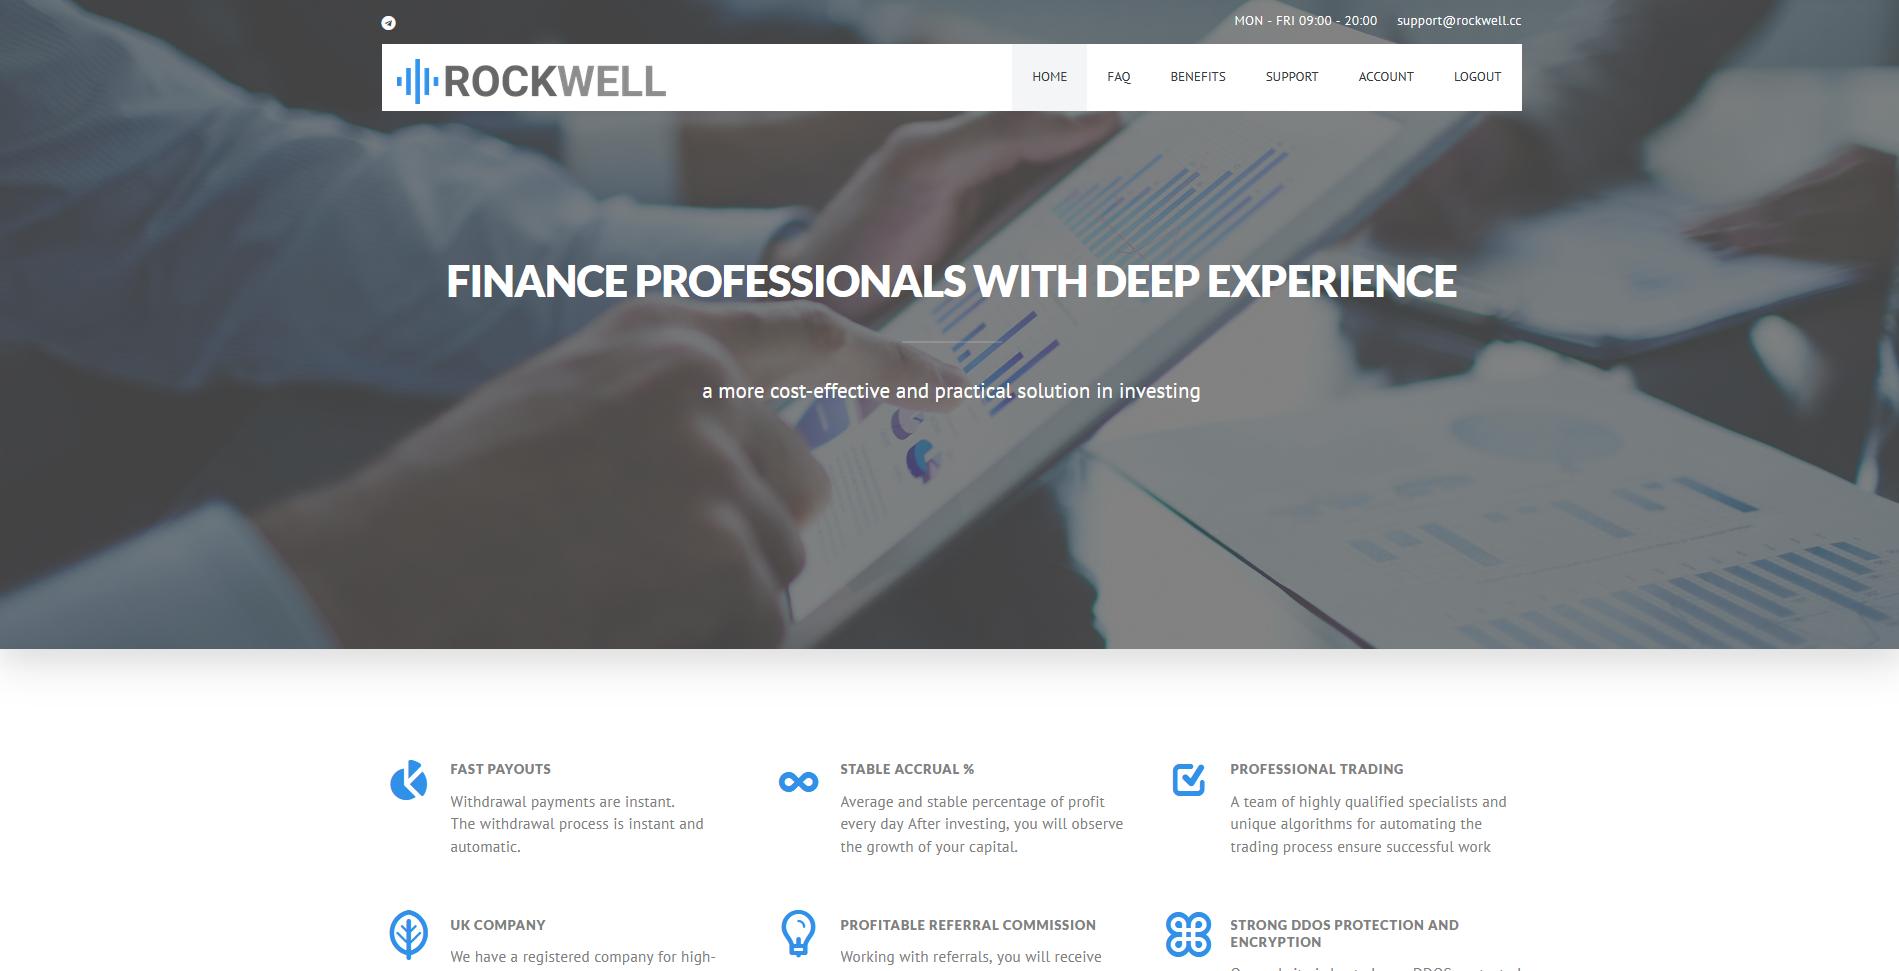 ROCKWELL - rockwell.cc